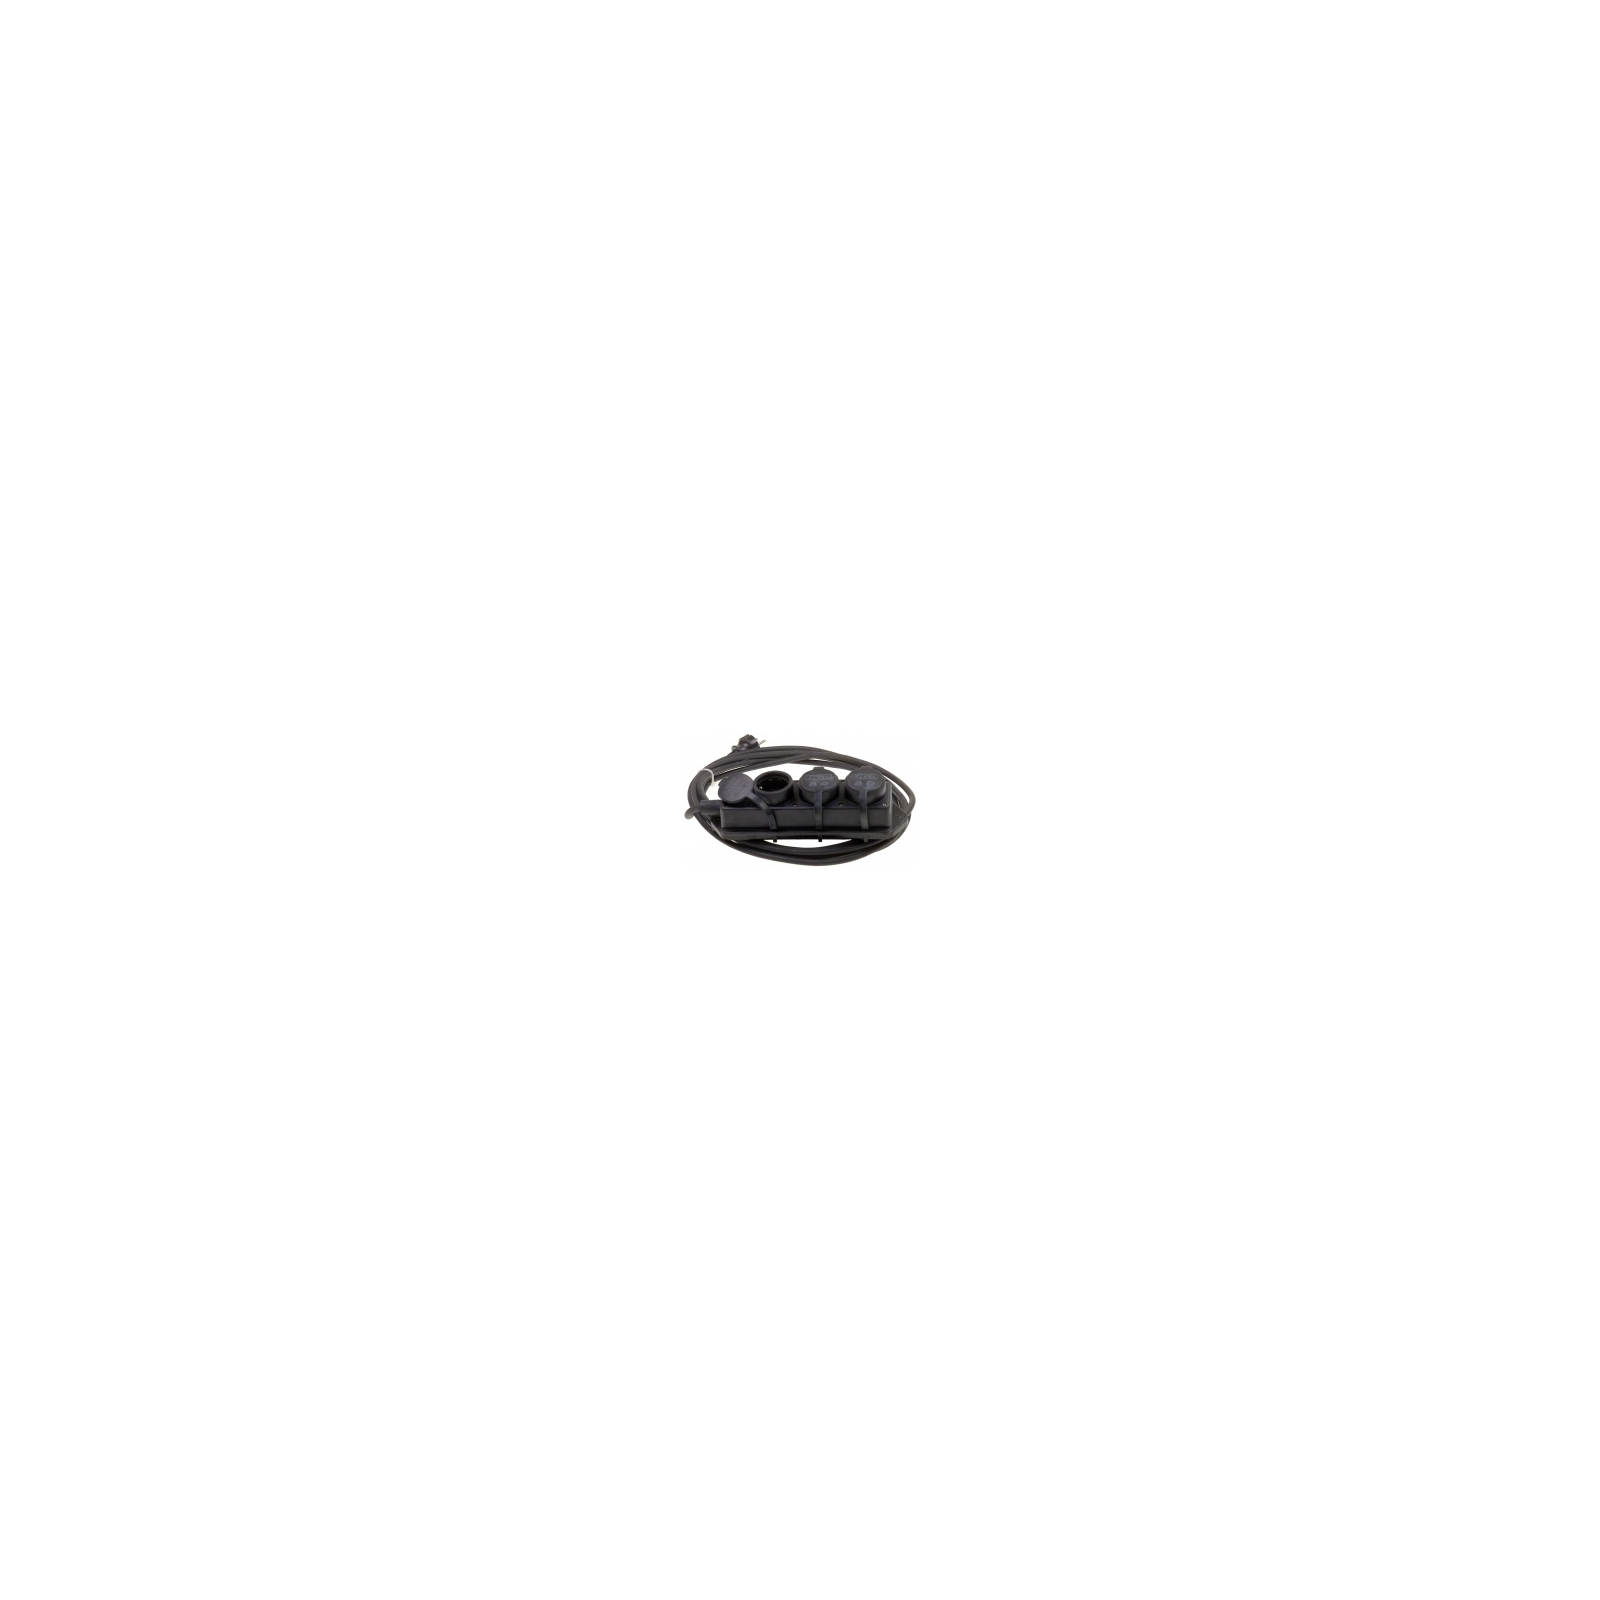 contactblok rubber 3 v 10 meter nwpk h07rn f 3x1 5 mm bouwcenter koolschijn. Black Bedroom Furniture Sets. Home Design Ideas